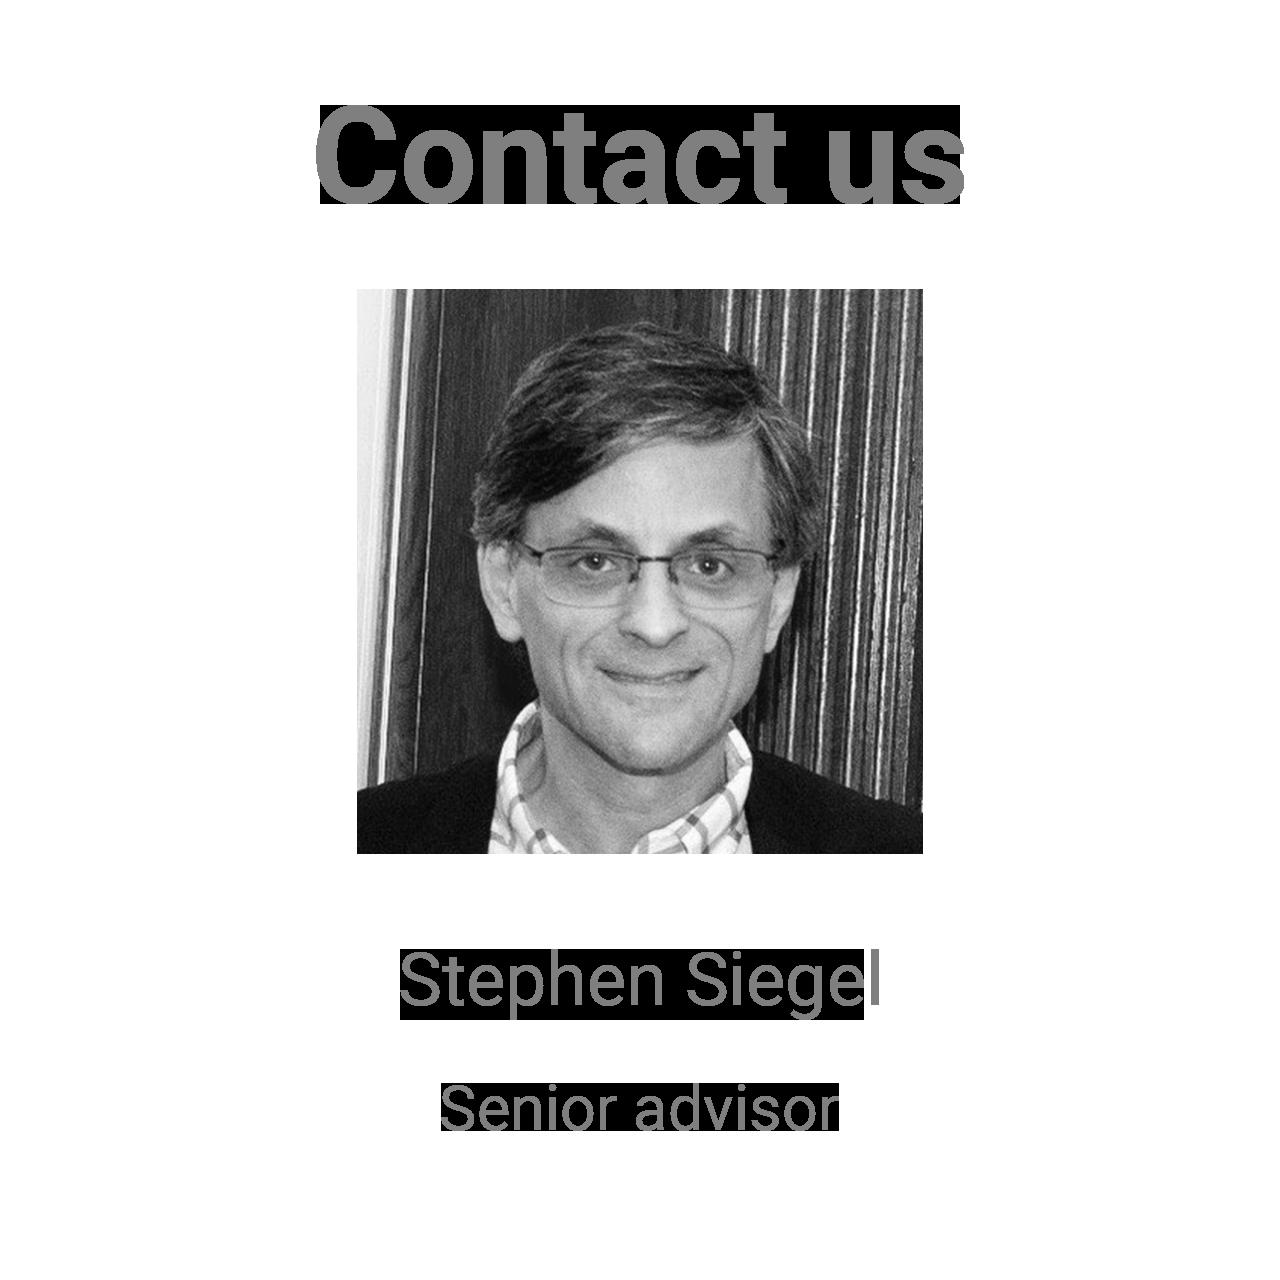 Stephen Siegel Contact us